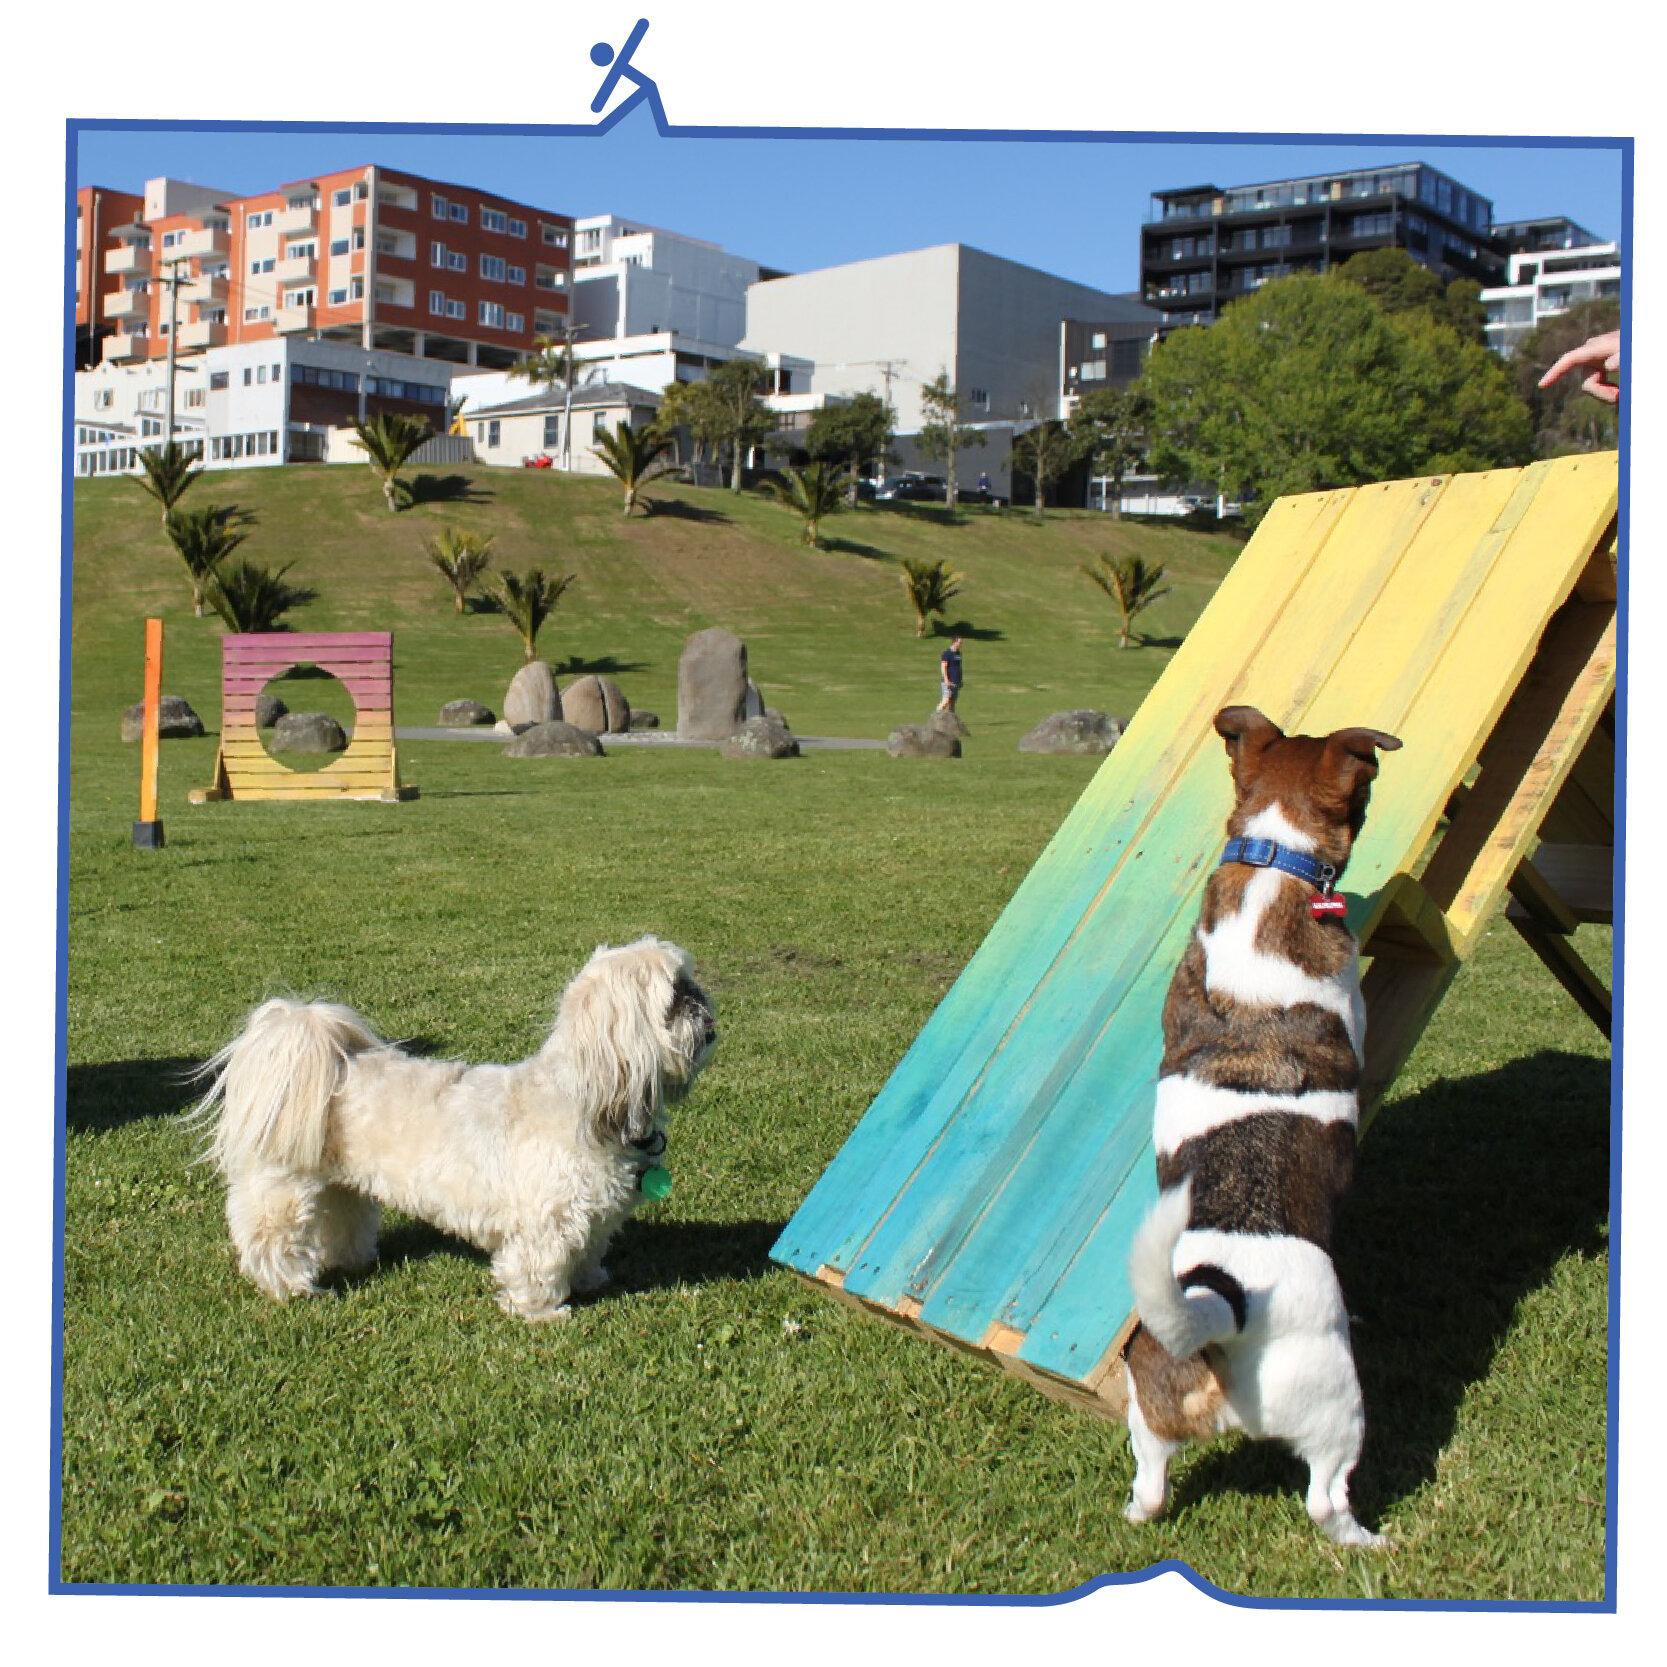 TMPW_CaseStudy__Dog Park .jpg